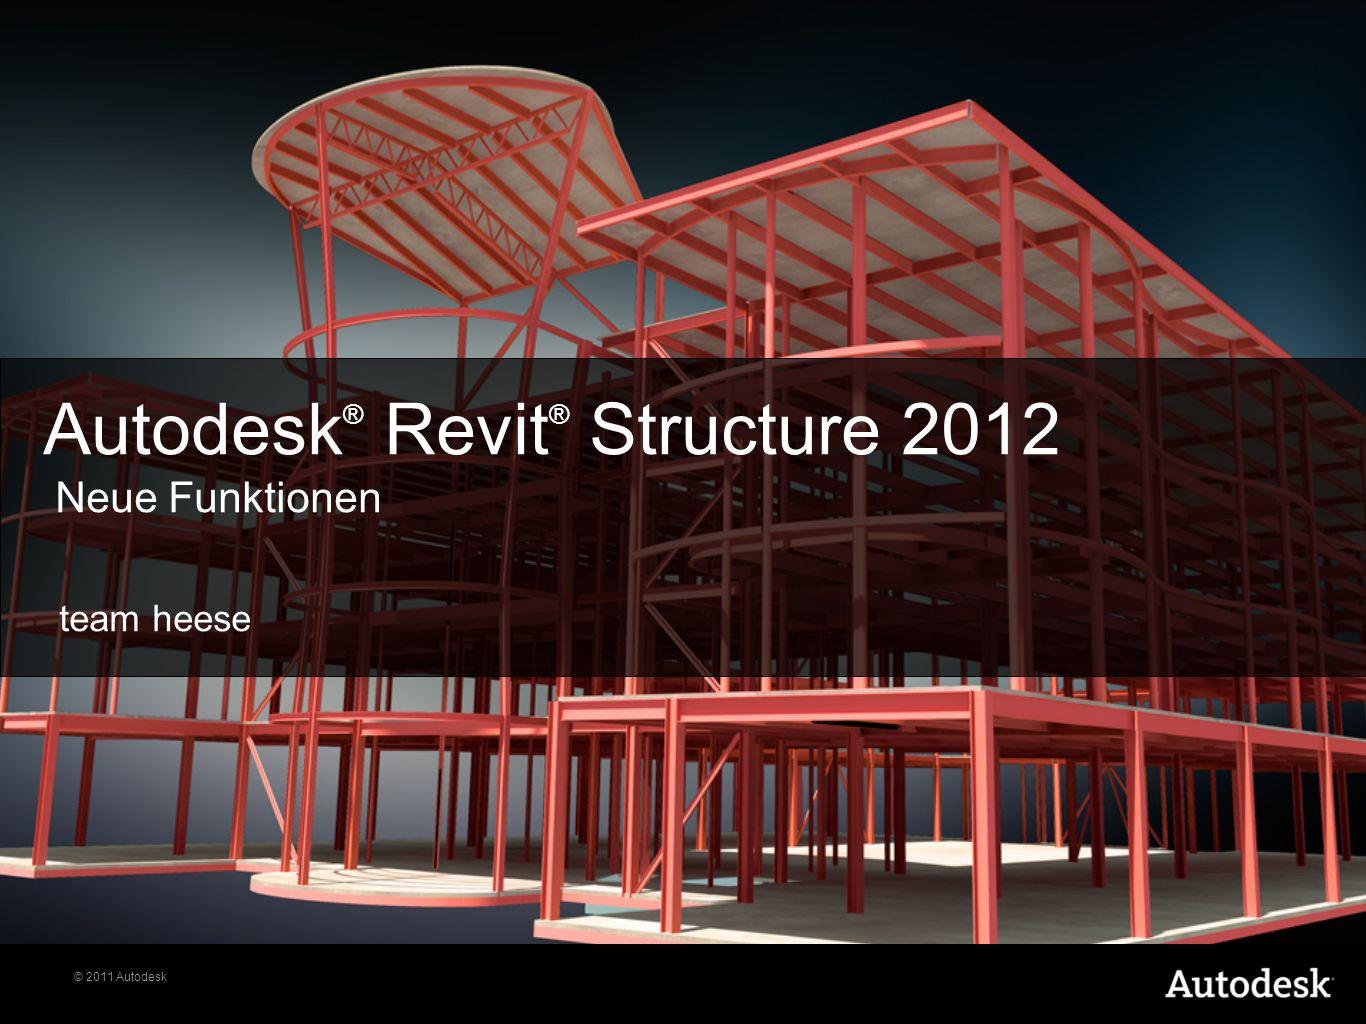 © © 2011 Autodesk team heese Autodesk ® Revit ® Structure 2012 Neue Funktionen